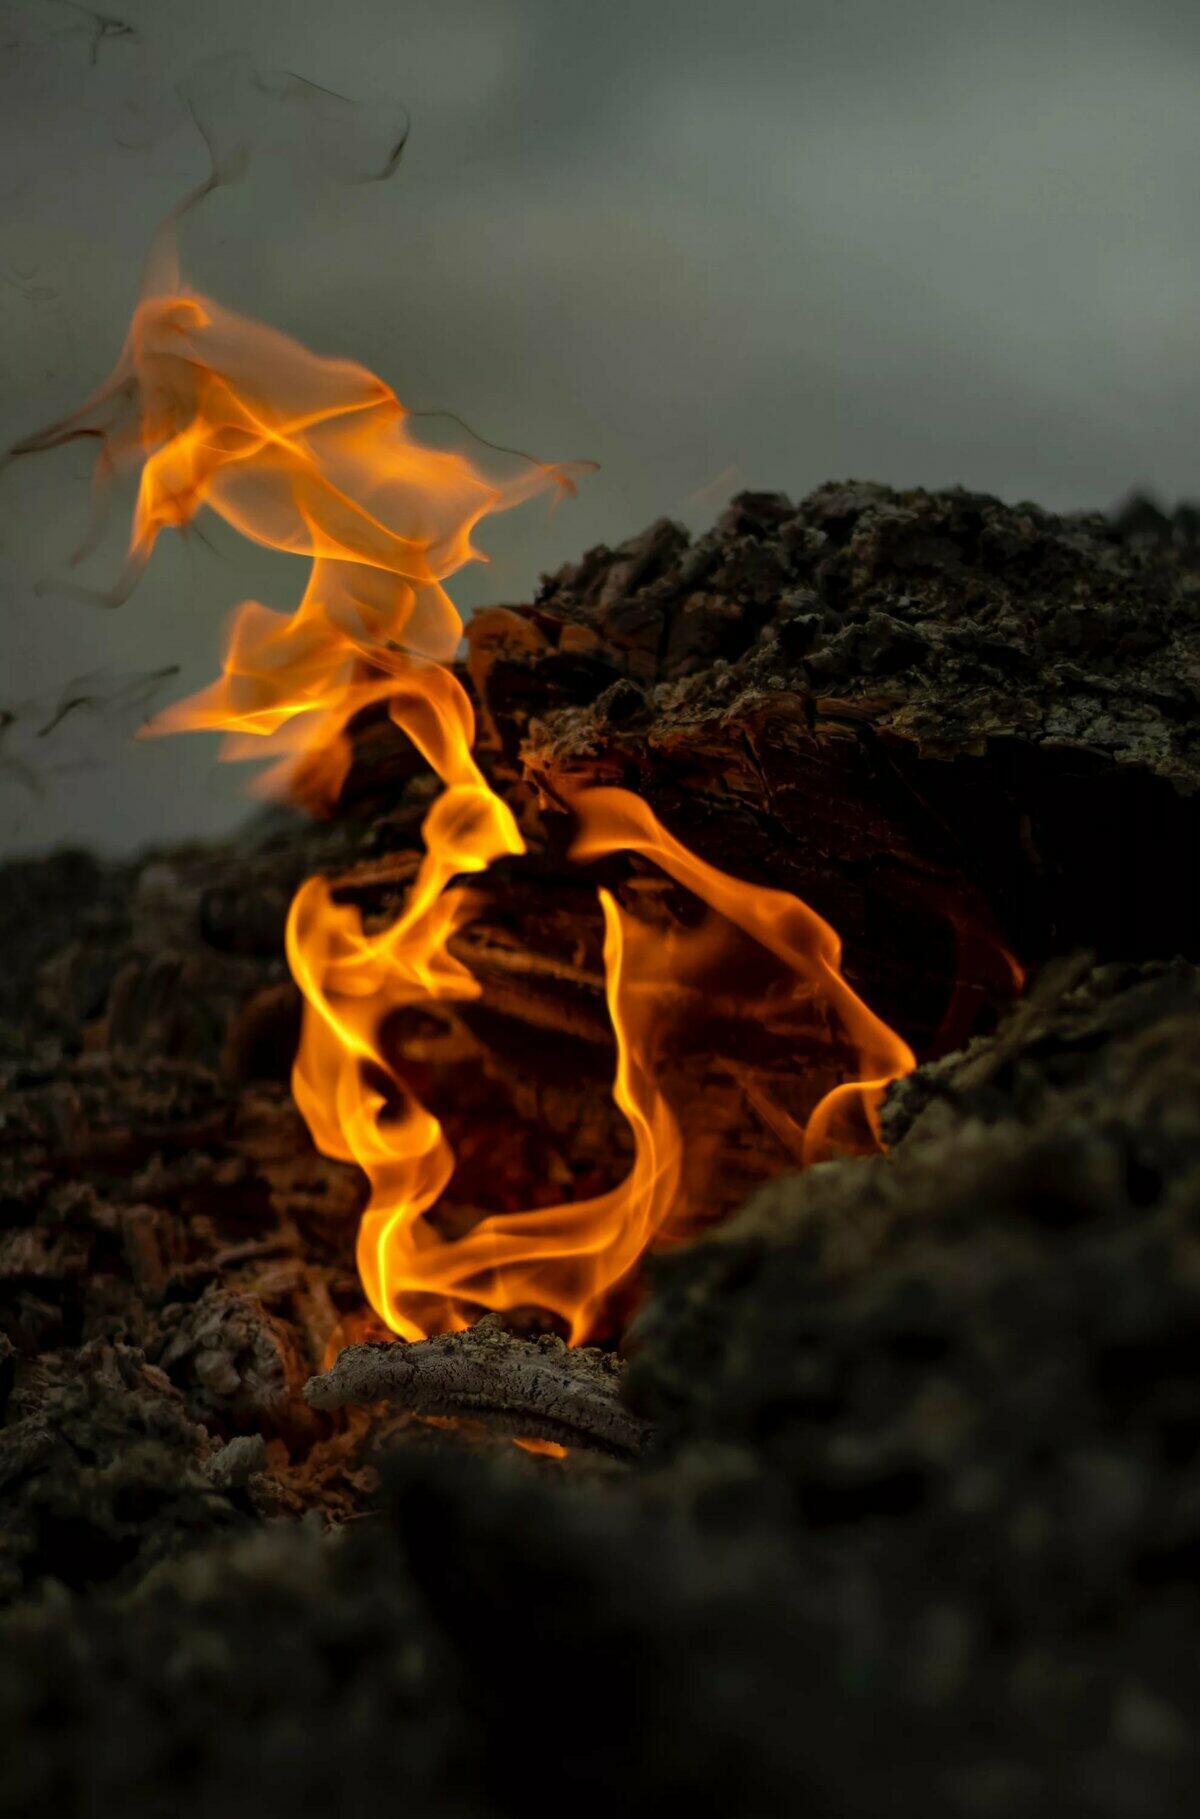 Огонь угас